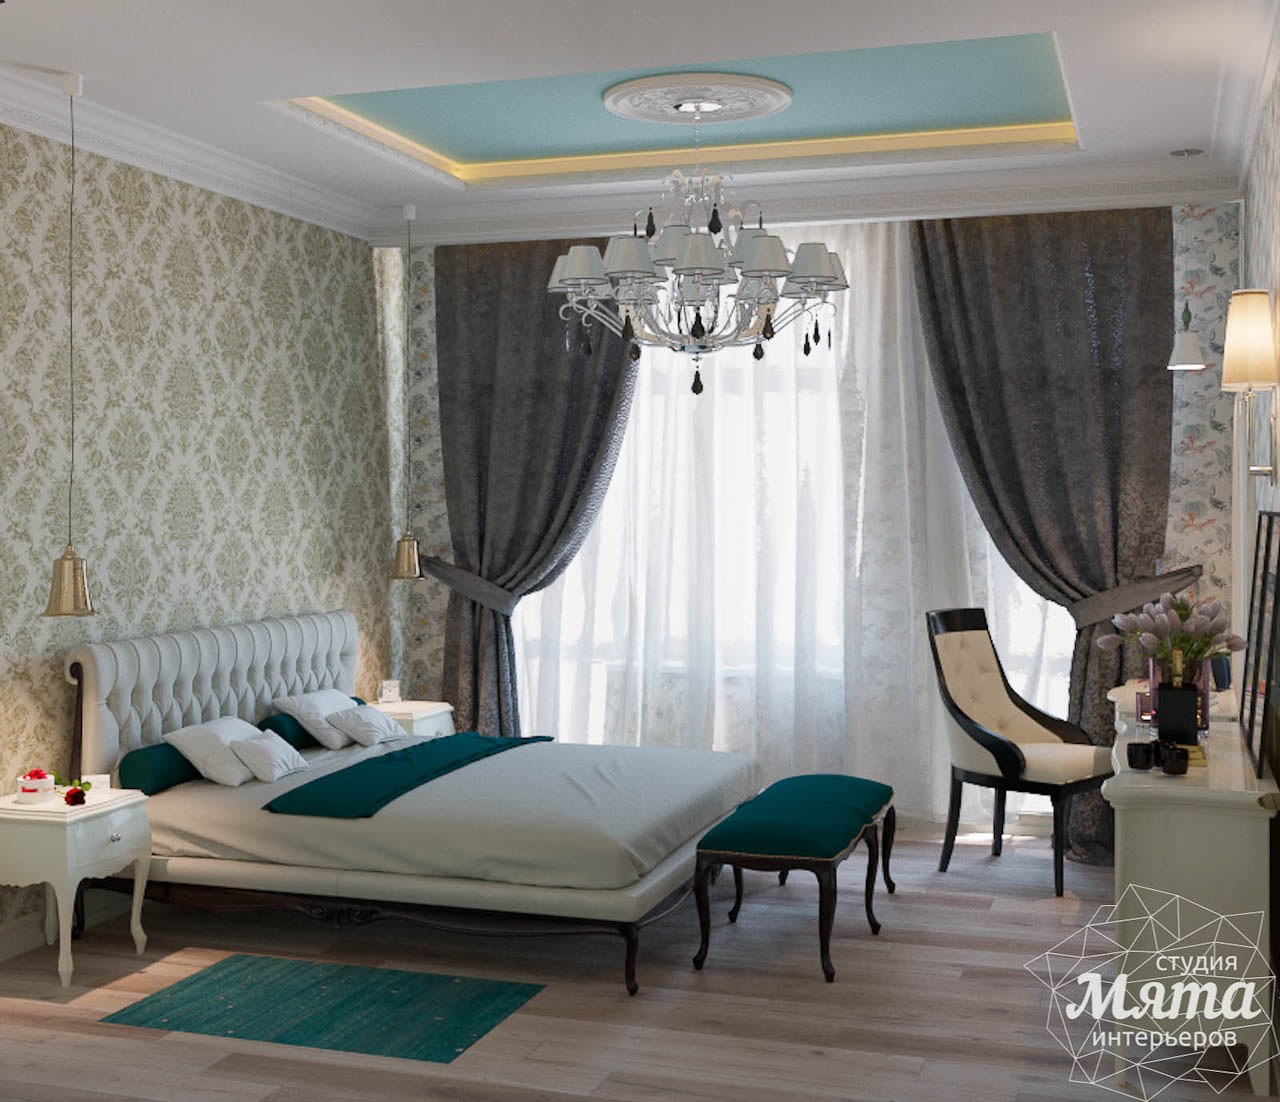 Дизайн интерьера и ремонт трехкомнатной квартиры в Карасьозерском 2 img1781243521